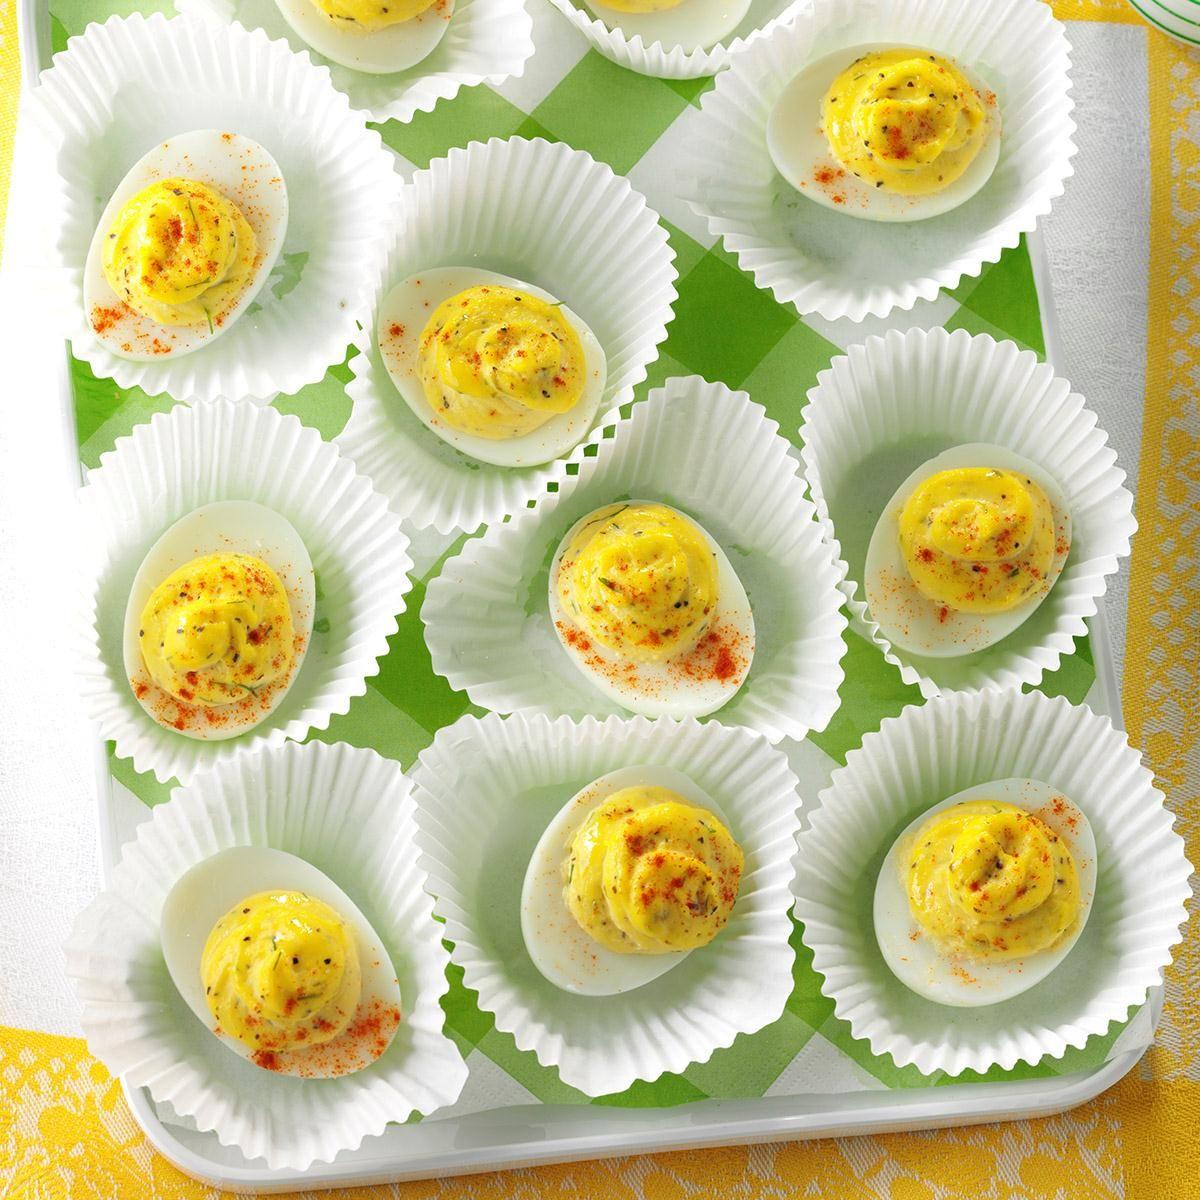 Garlic dill deviled eggs recipe devil garlic and egg food forumfinder Gallery